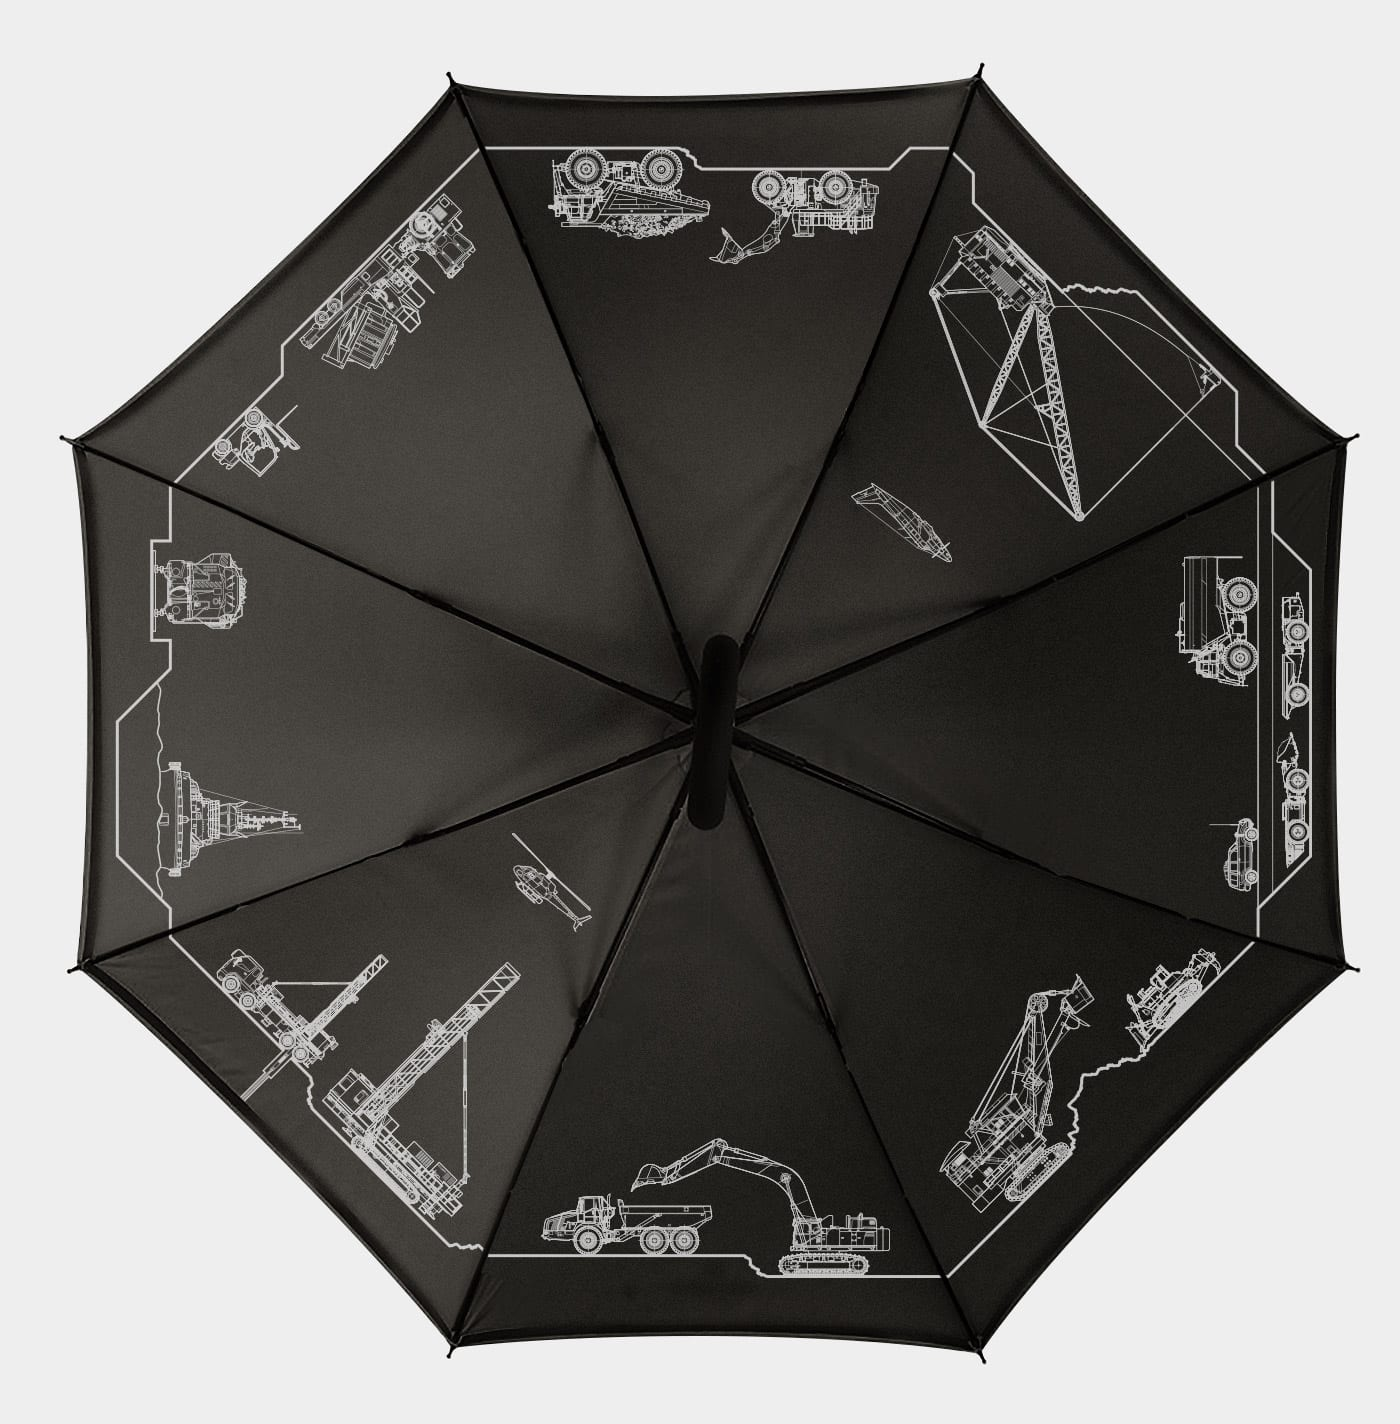 Mike-Garland-Illustration-Rio-Tinto-Umbrella-Inside-Canopy